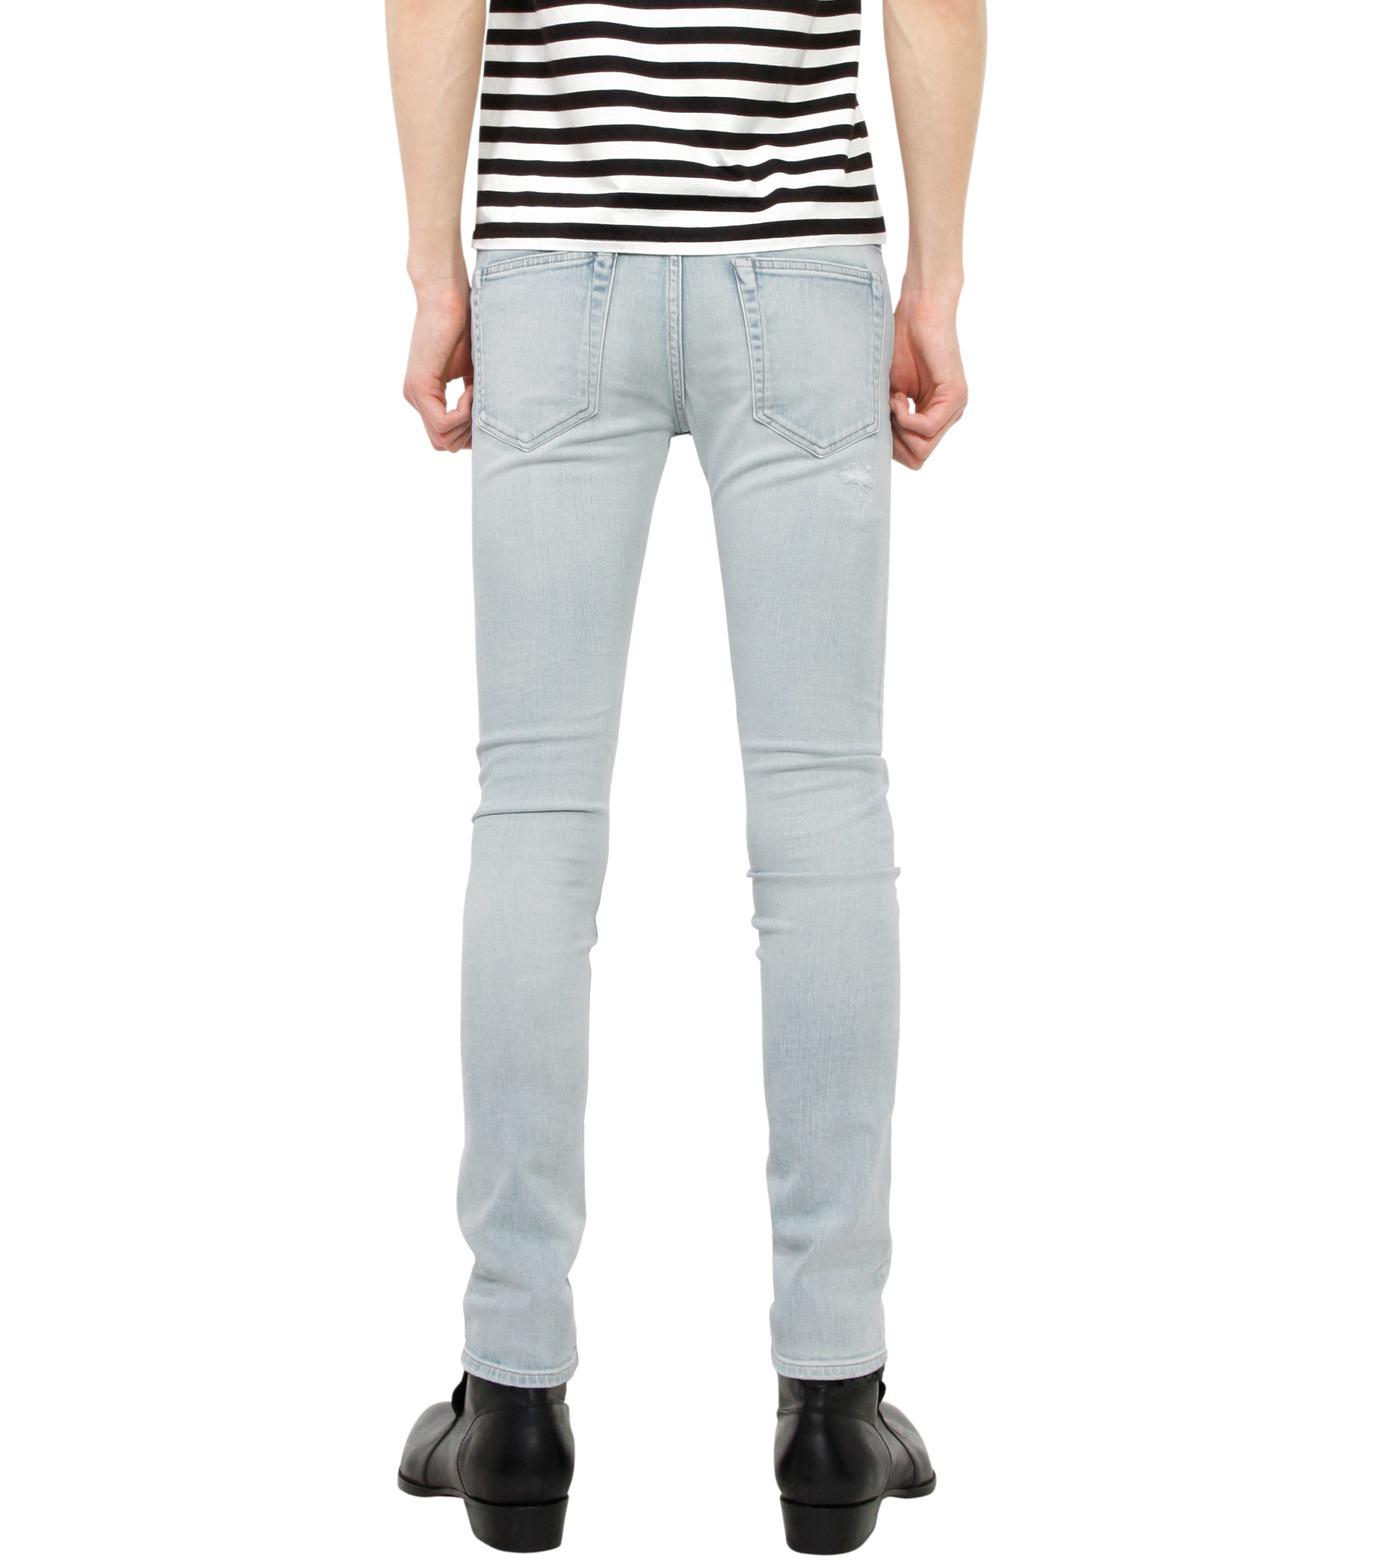 HL HEDDIE LOVU(エイチエル・エディールーヴ)のbleach skin slim-LIGHT BLUE(パンツ/pants)-18S98001-91 拡大詳細画像2